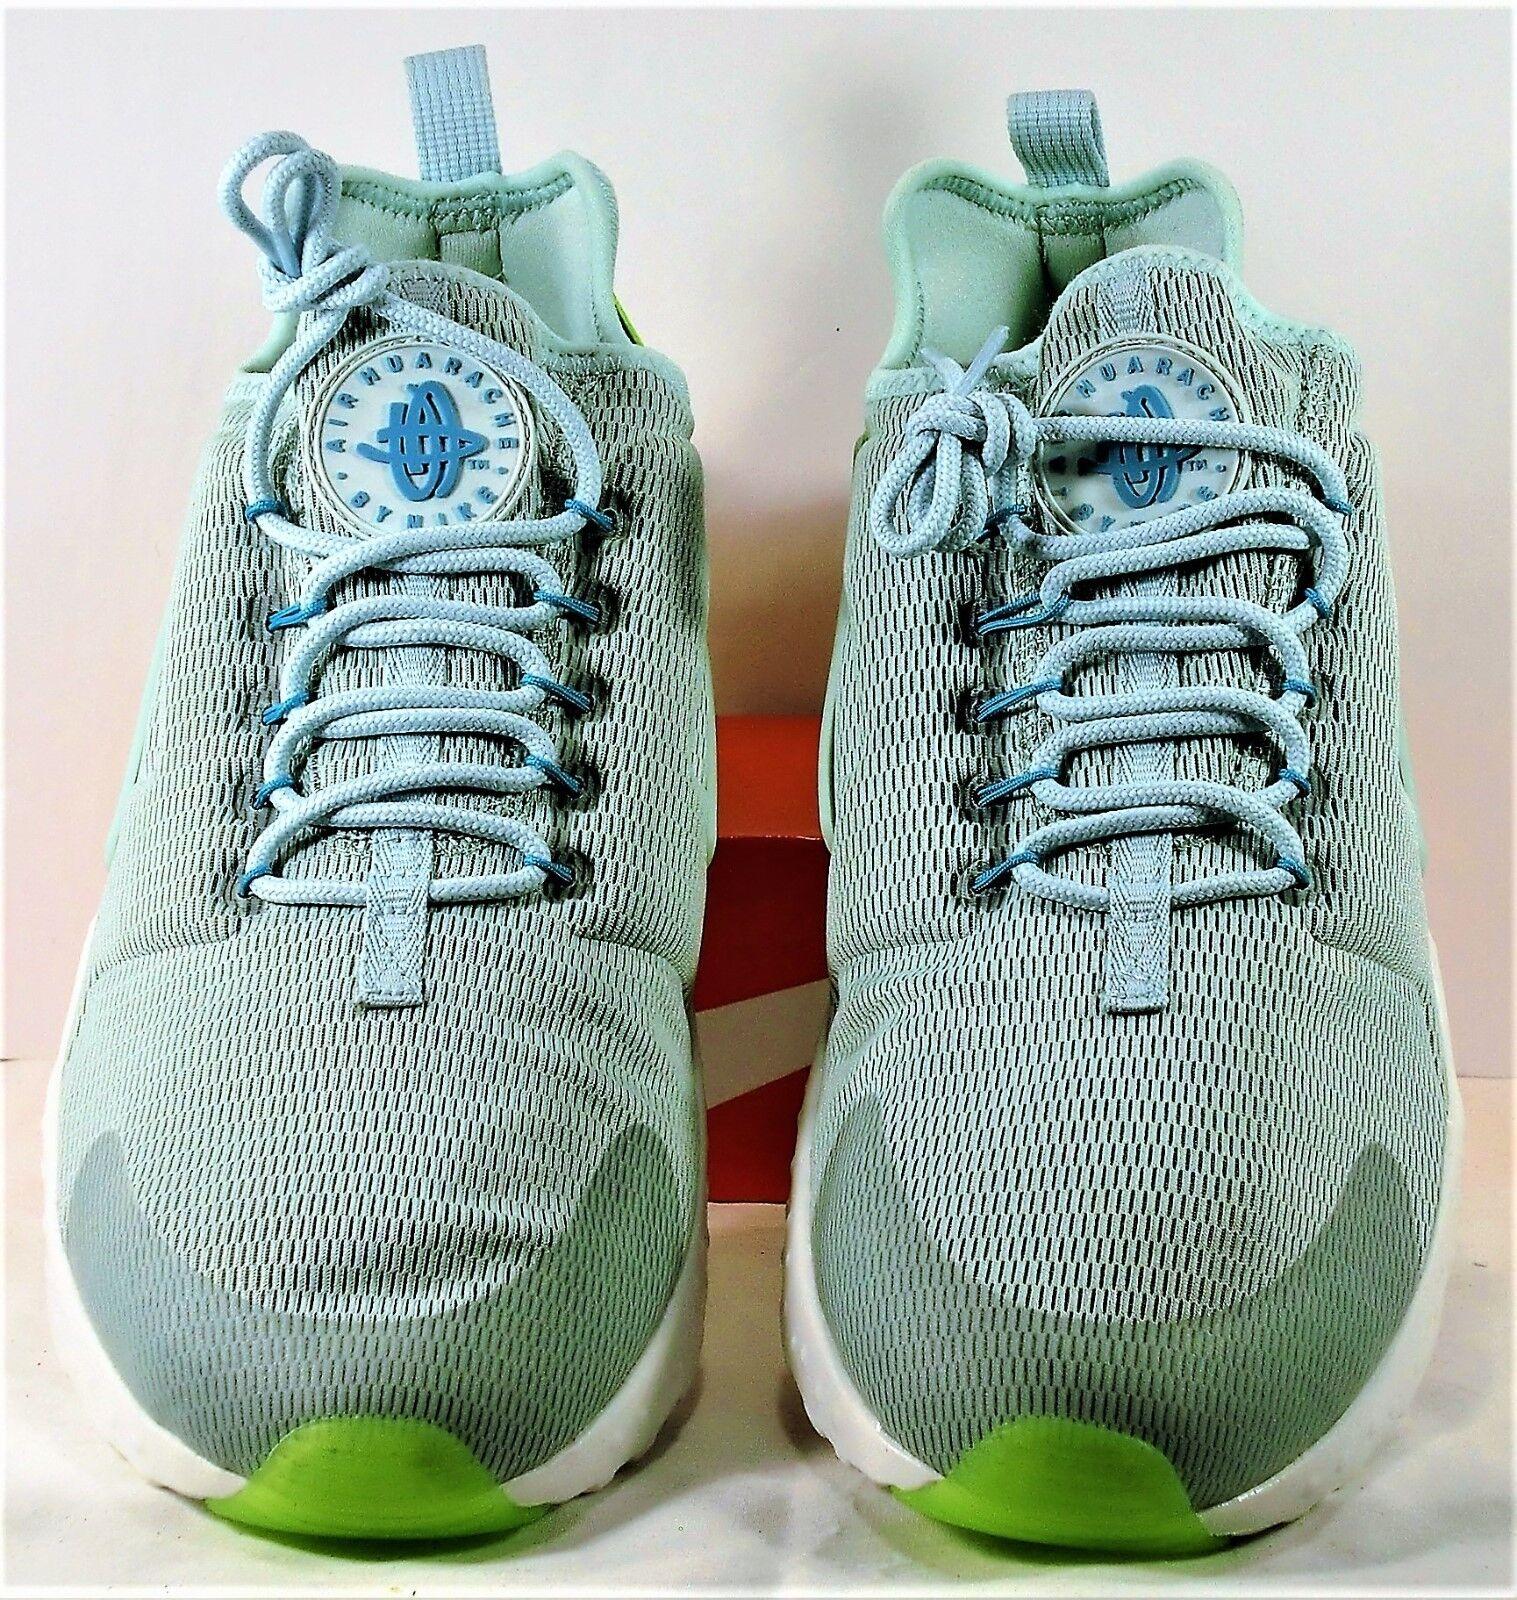 1e3b87214ea8 ... Nike Air Huarache Run Run Run Ultra Green   White Women Running Sz 12  NEW 819151 ...